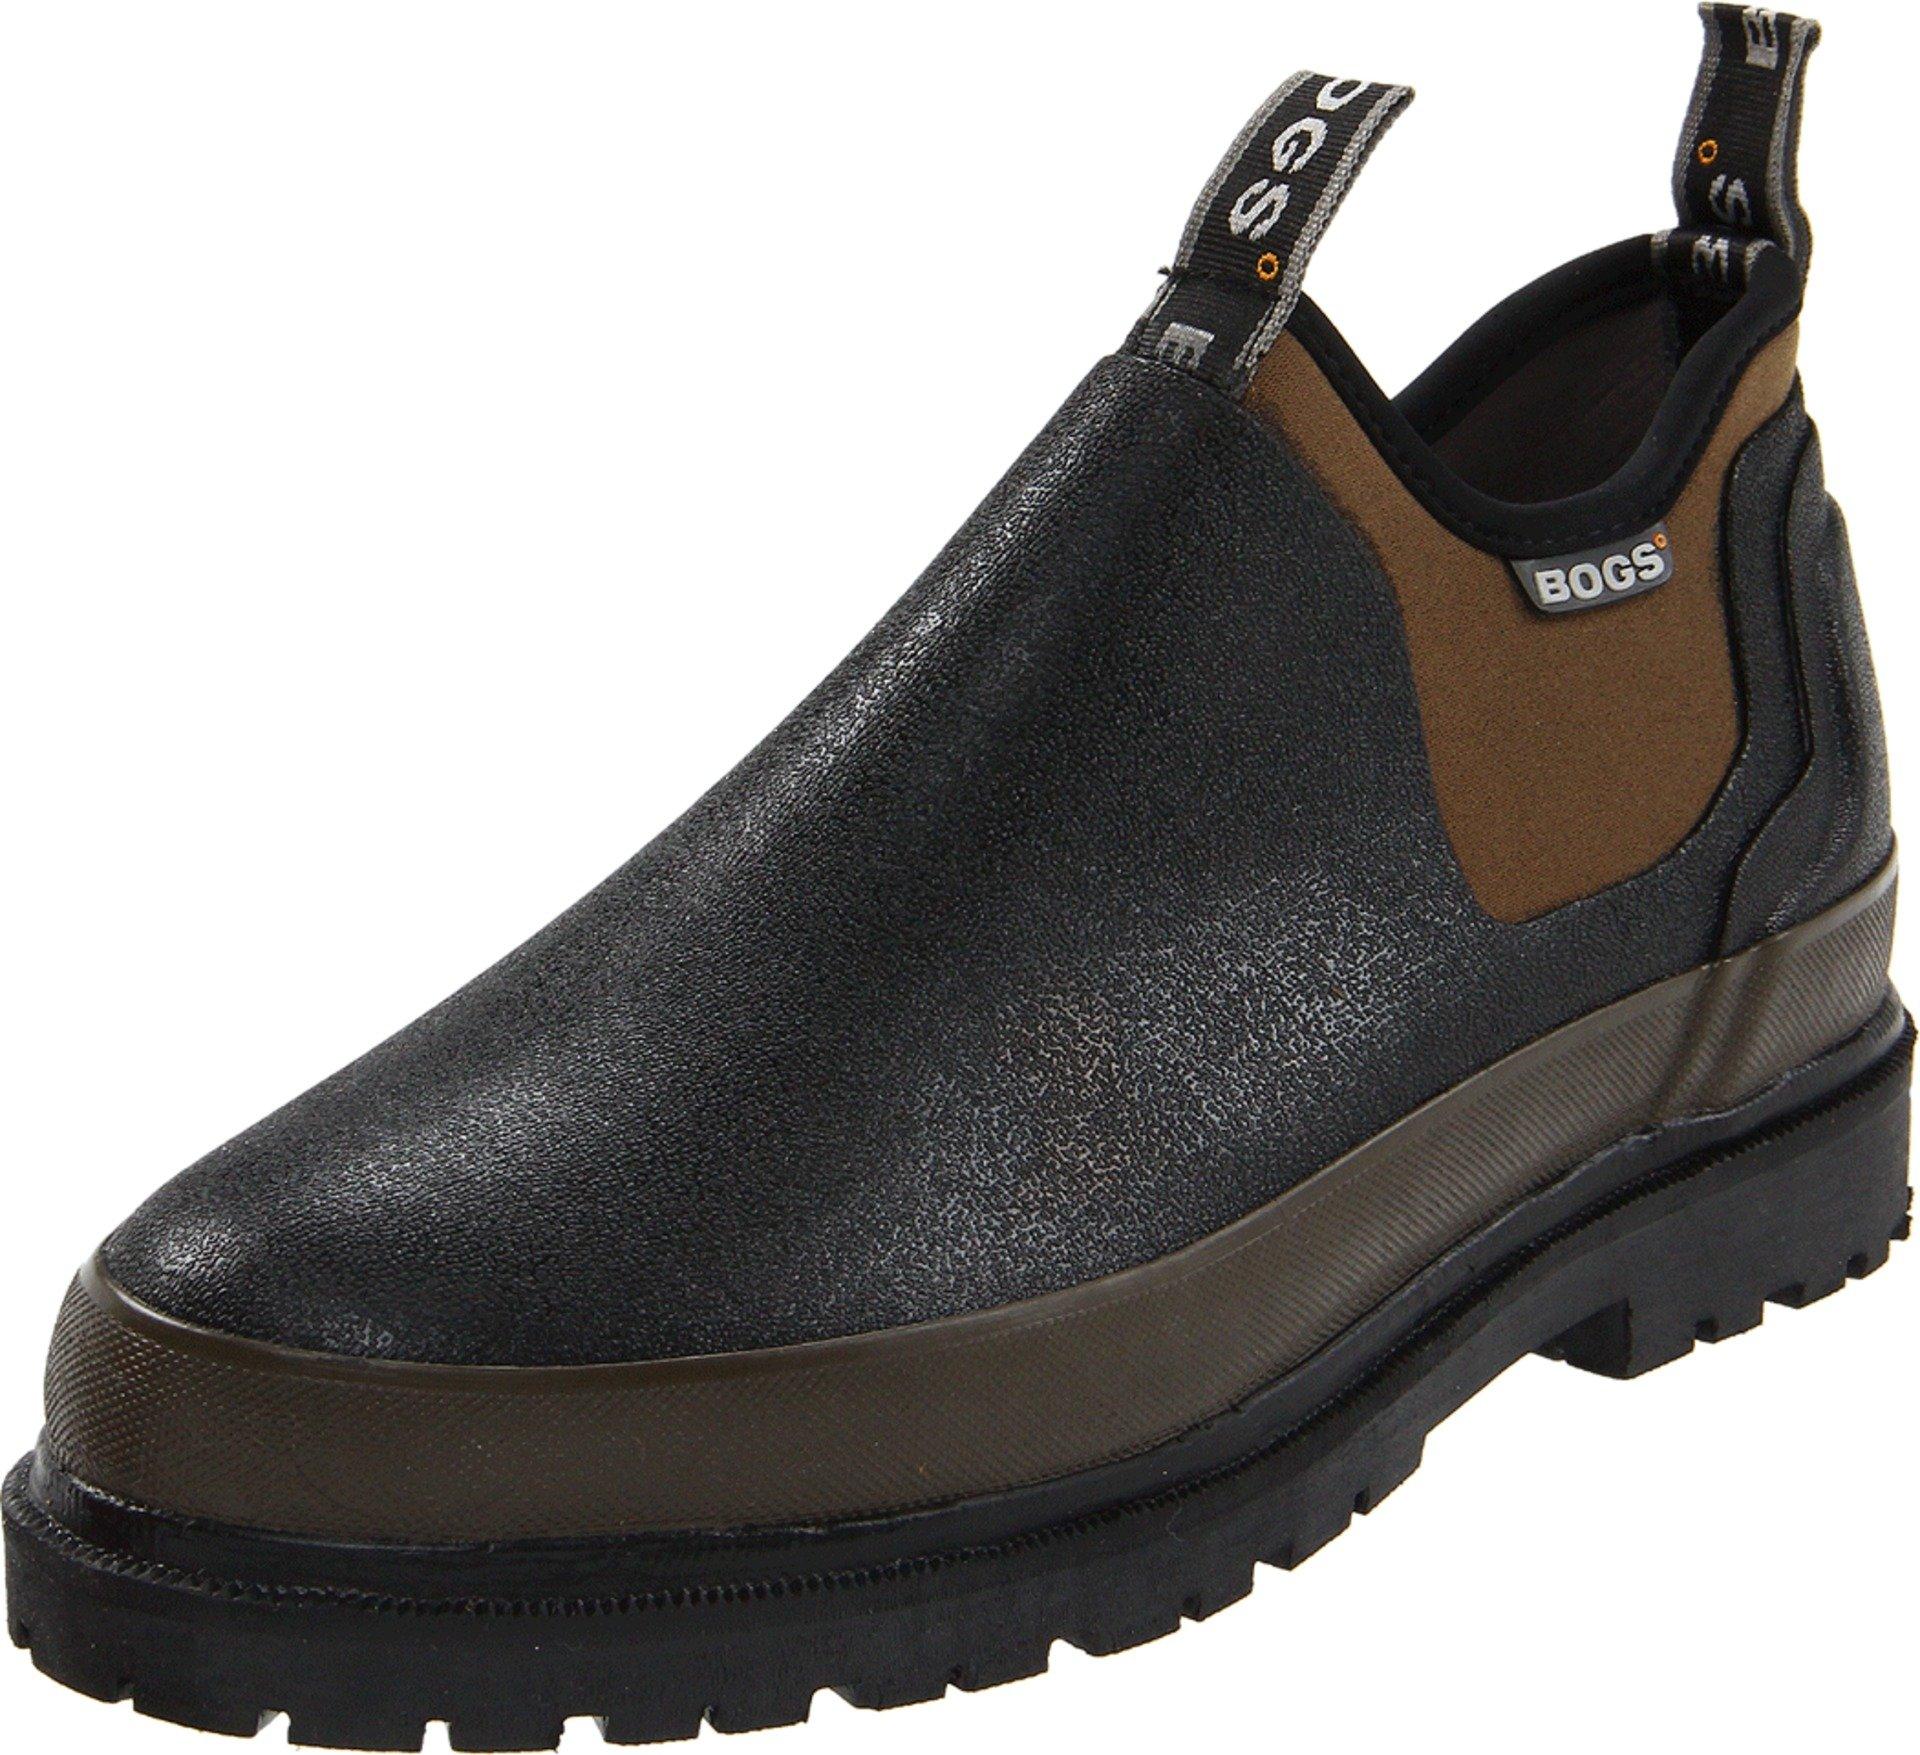 Bogs Men's Tillamook Bay Camo Slip On, Black, 12 D(M) US by Bogs